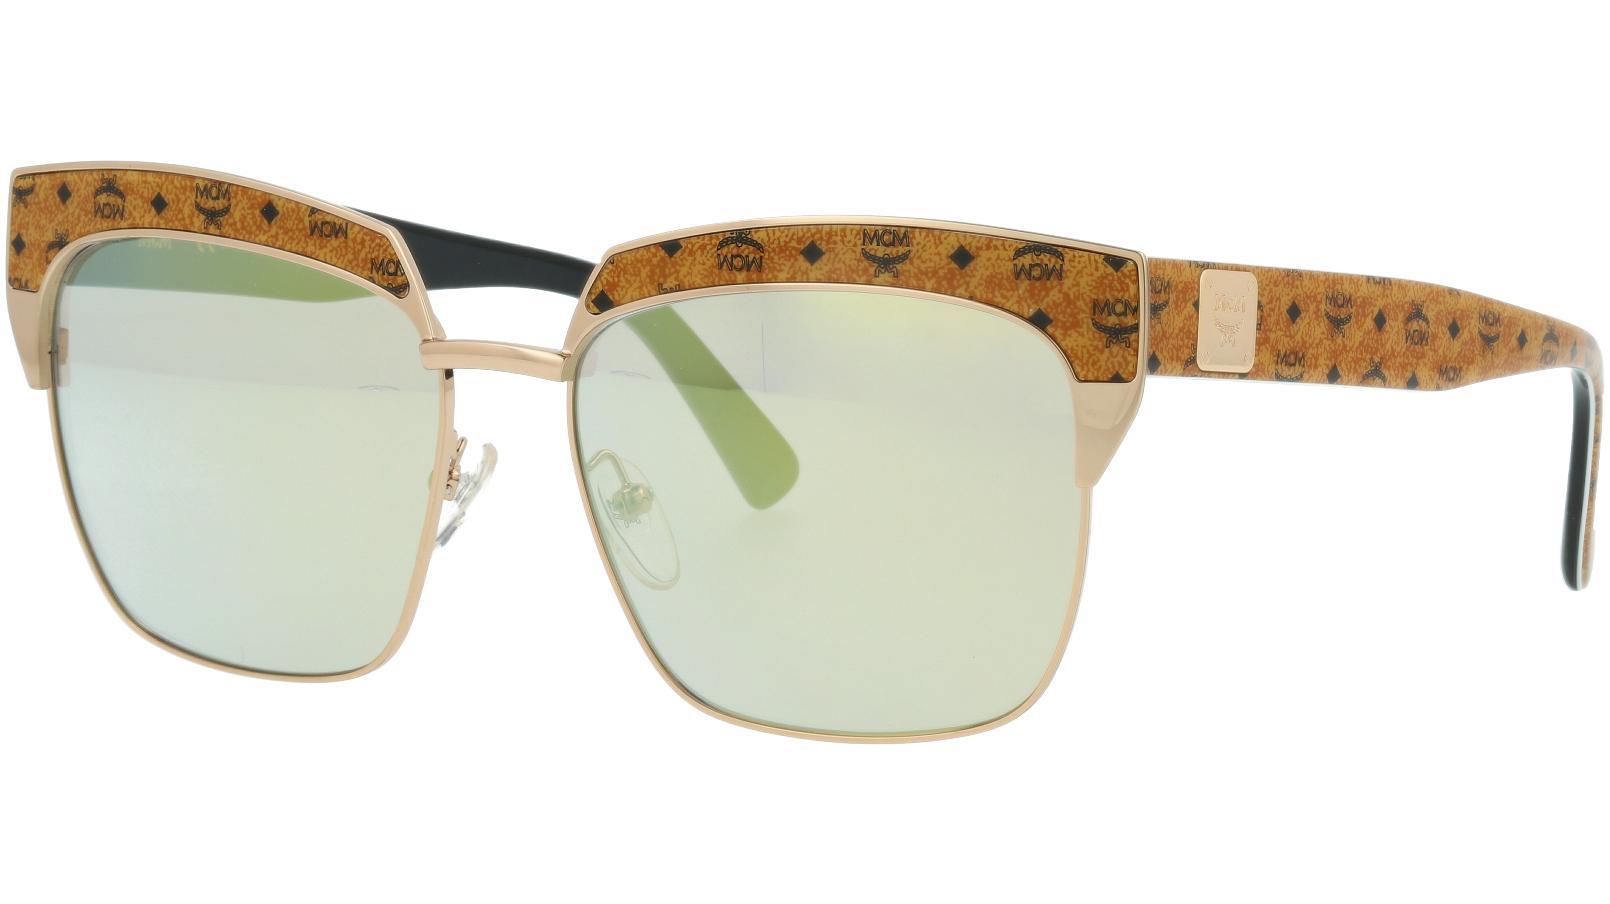 MCM MCM102S 782 56 SHINY Sunglasses